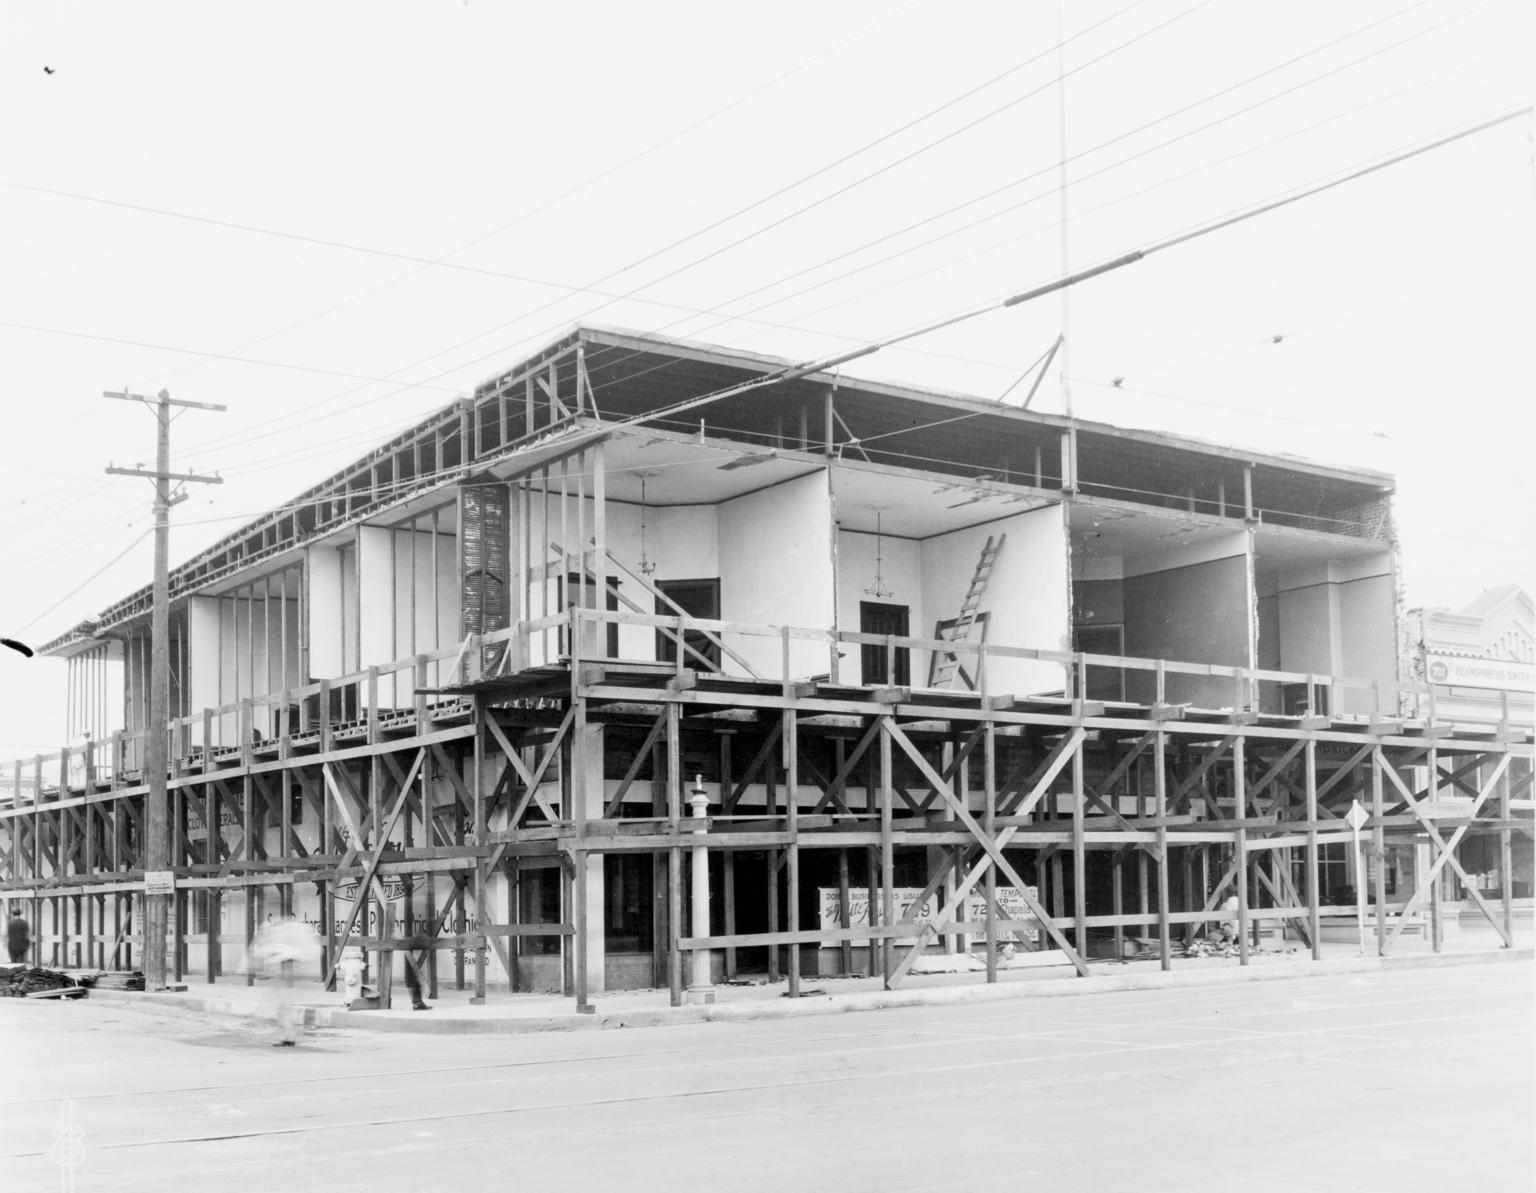 Santa Barbara 1925 Earthquake Damage - 700 Block State Street